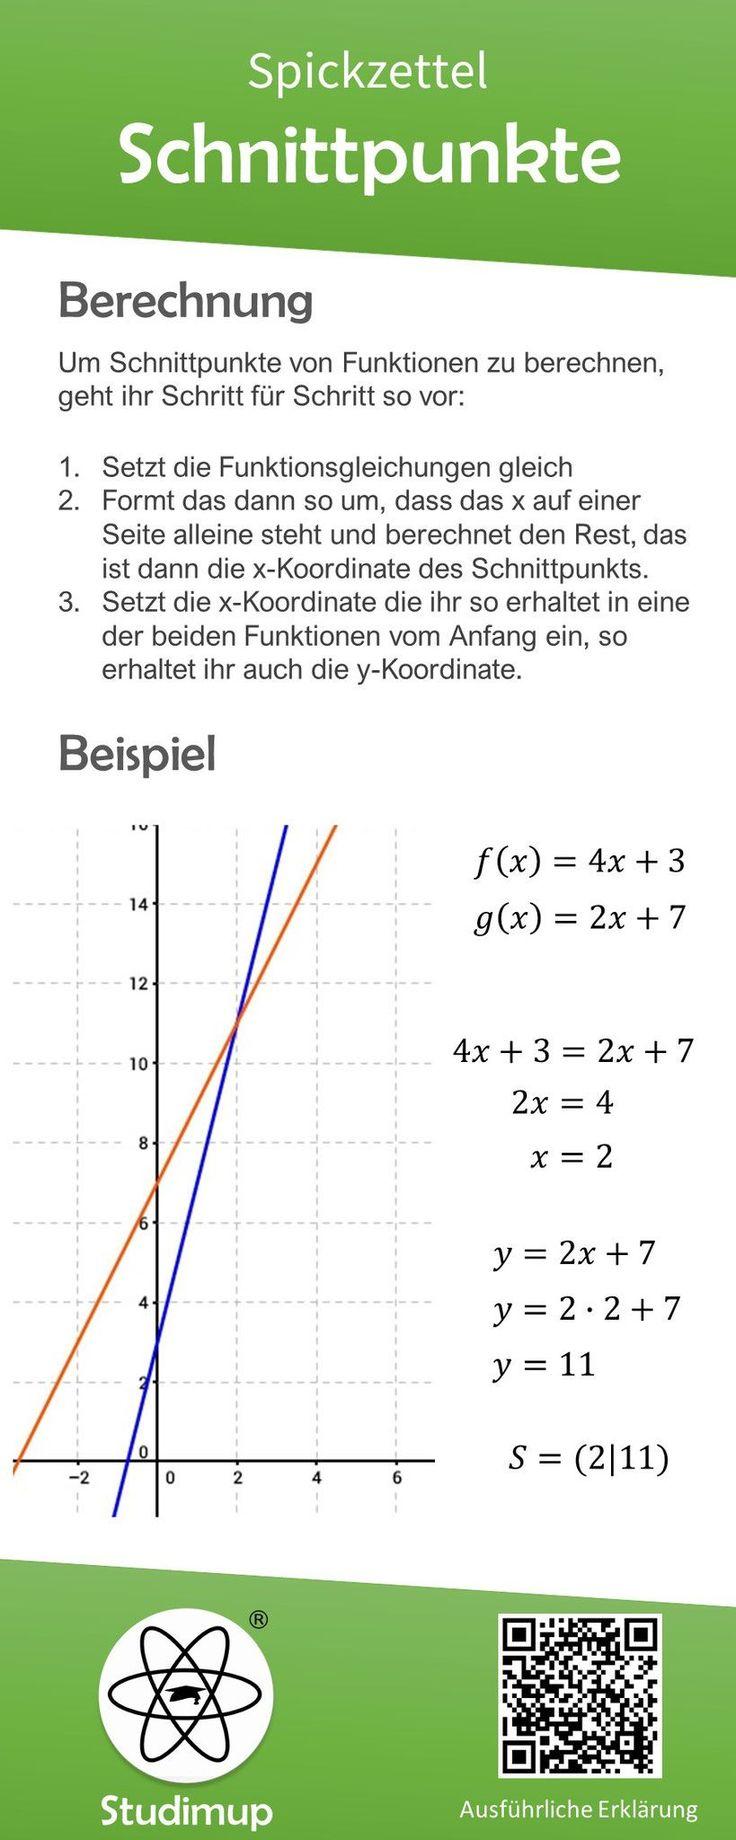 Mathe Spickzettel Studimup De Math Methods Learning Math Mental Math